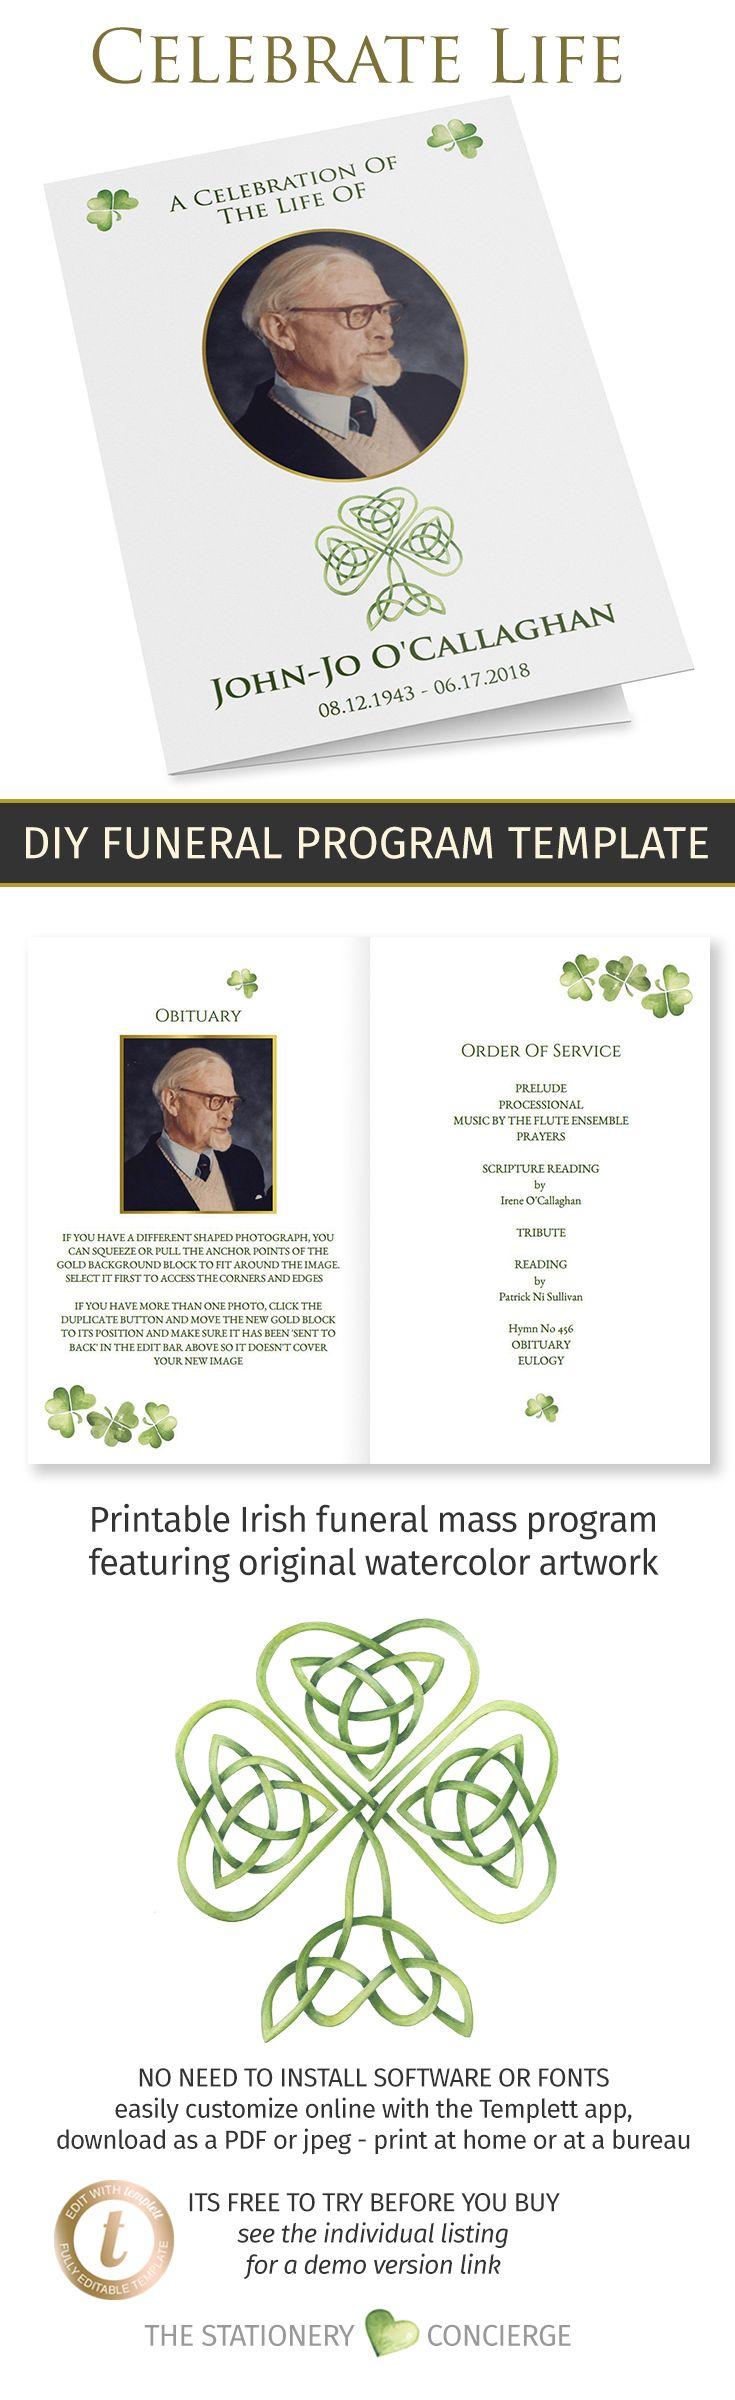 Irish catholic funeral mass photo order of service program